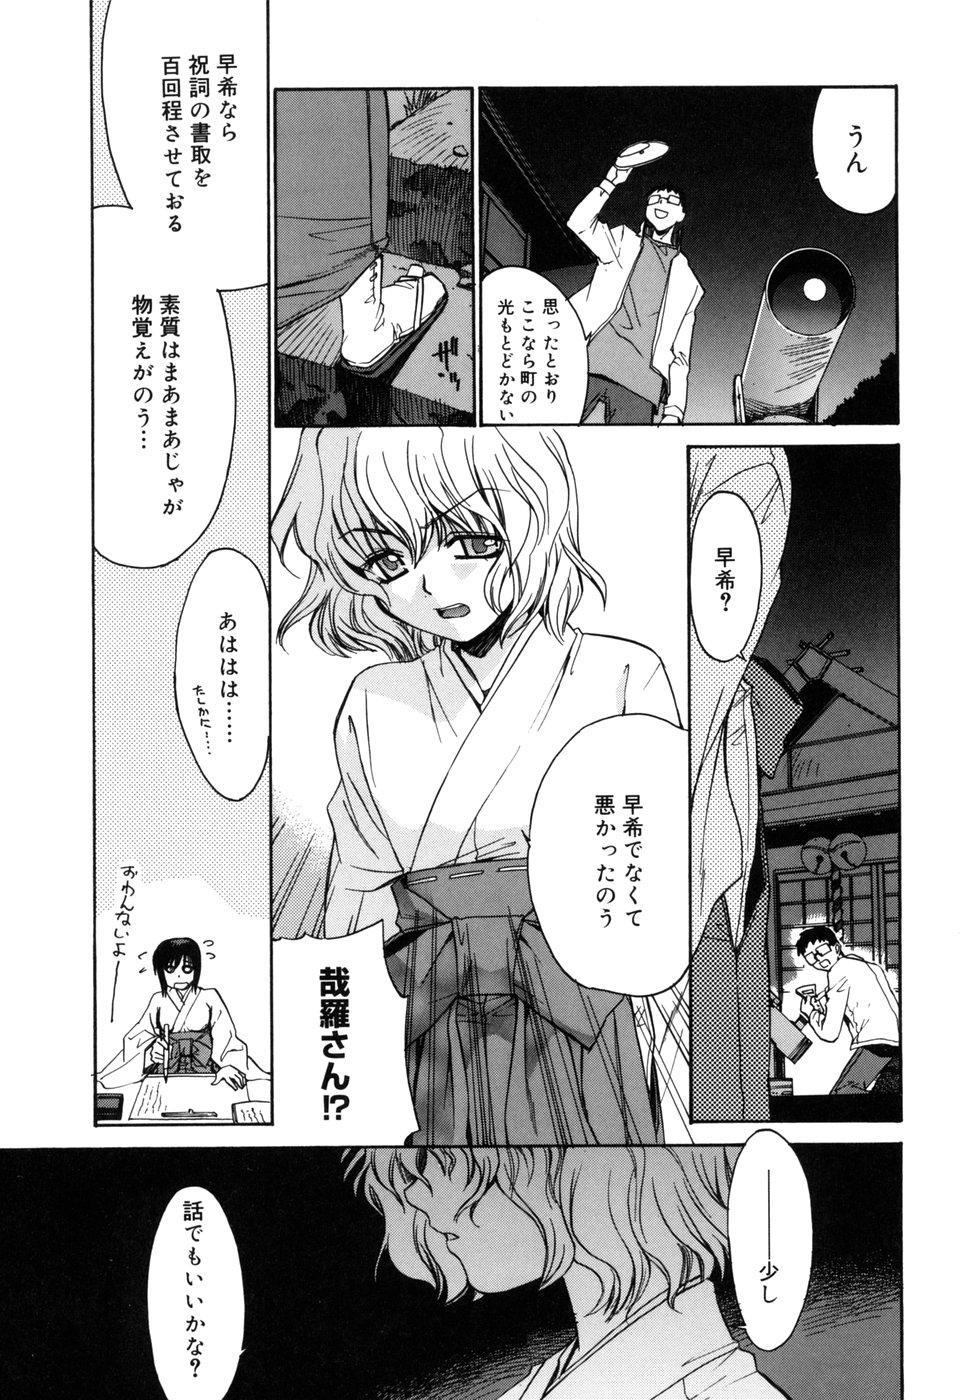 [Yaya Hinata] Tonari no Miko-san wa Minna Warau - The next shrine maidens smile in everyone. 48